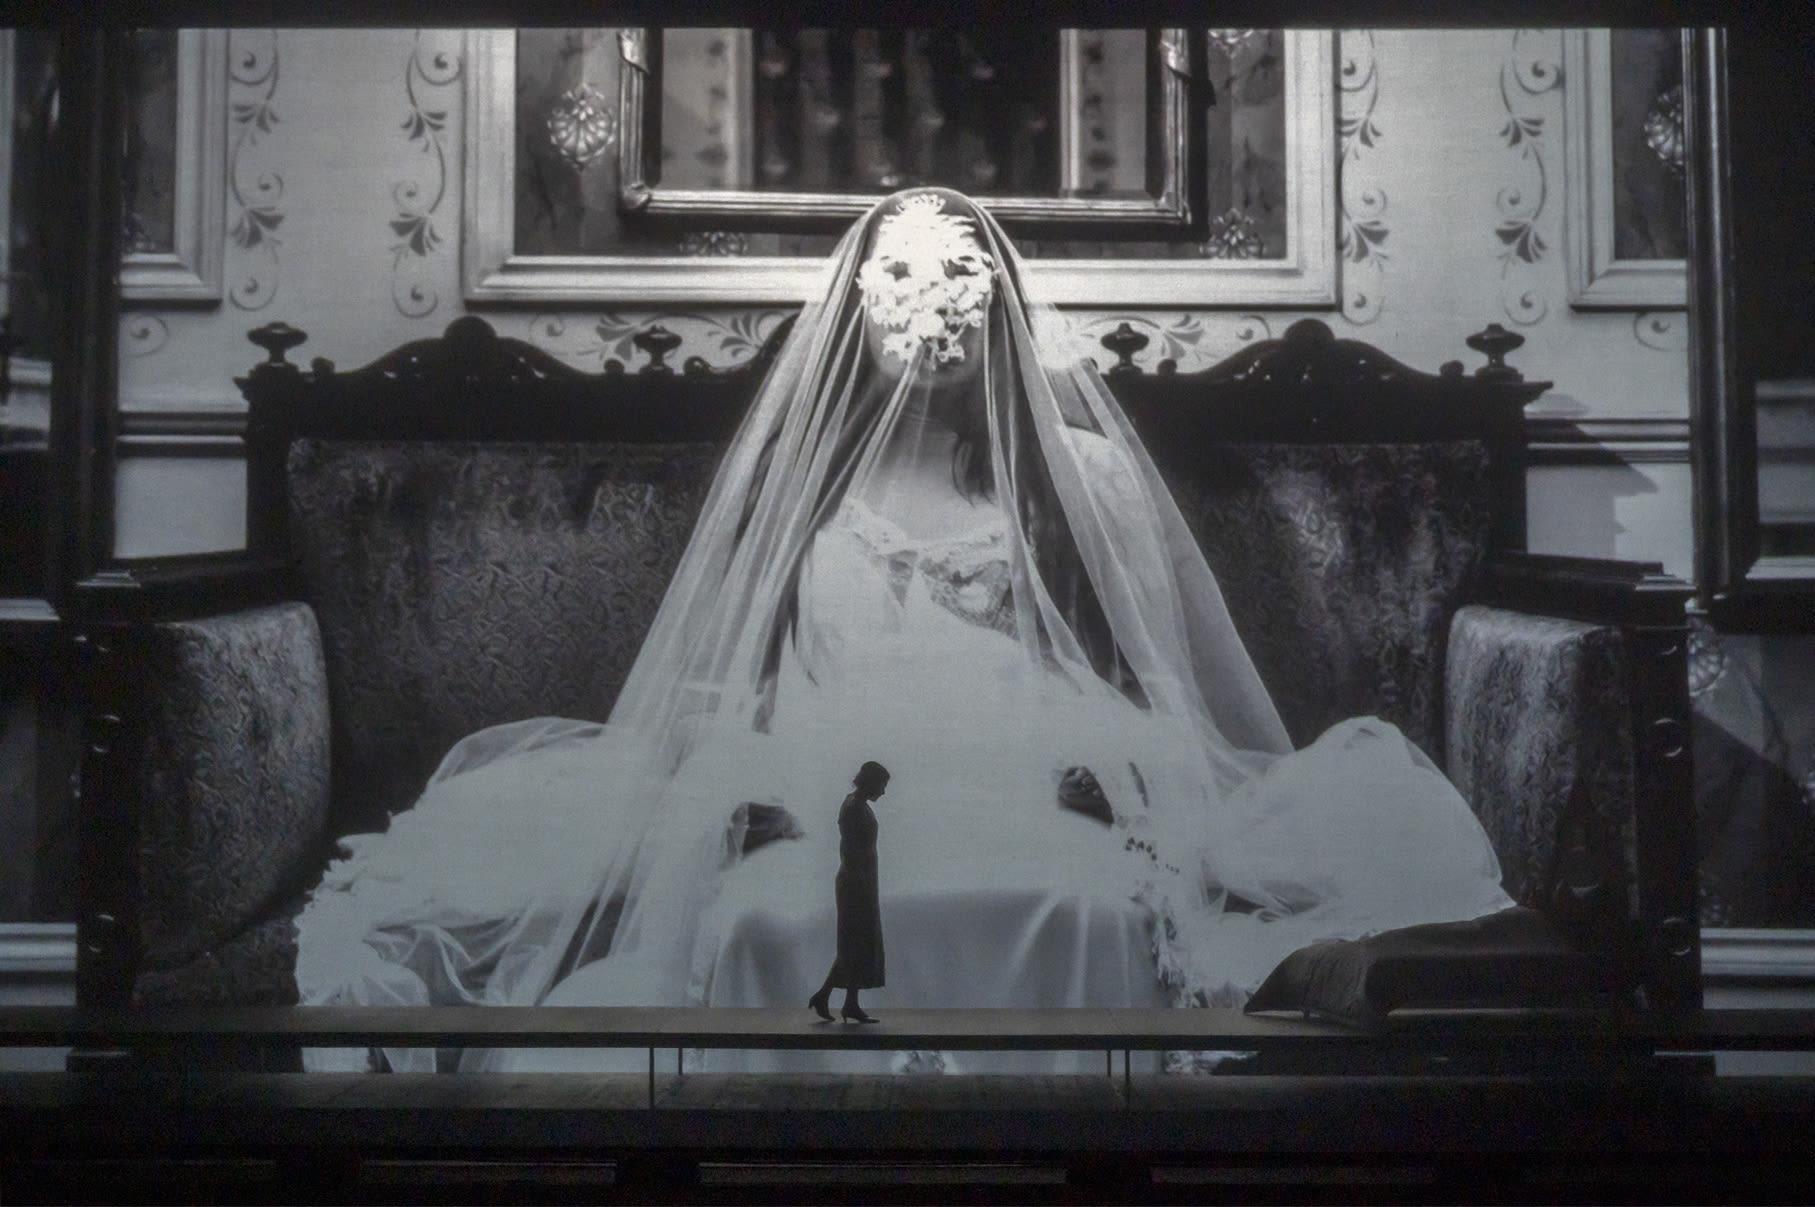 7 Deaths of Maria Callas 21-22 © Charles Duprat - OnP (1)